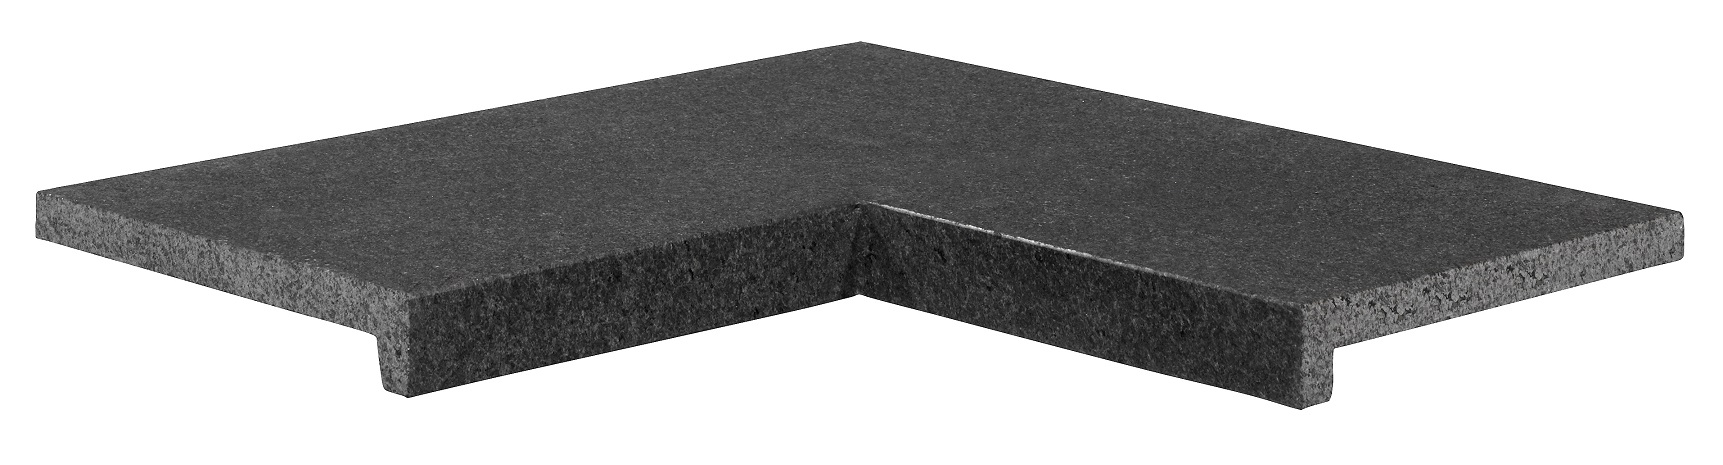 Poolplatten Ecke Granit 60/30×60/30×5/2,5 cm anthrazit